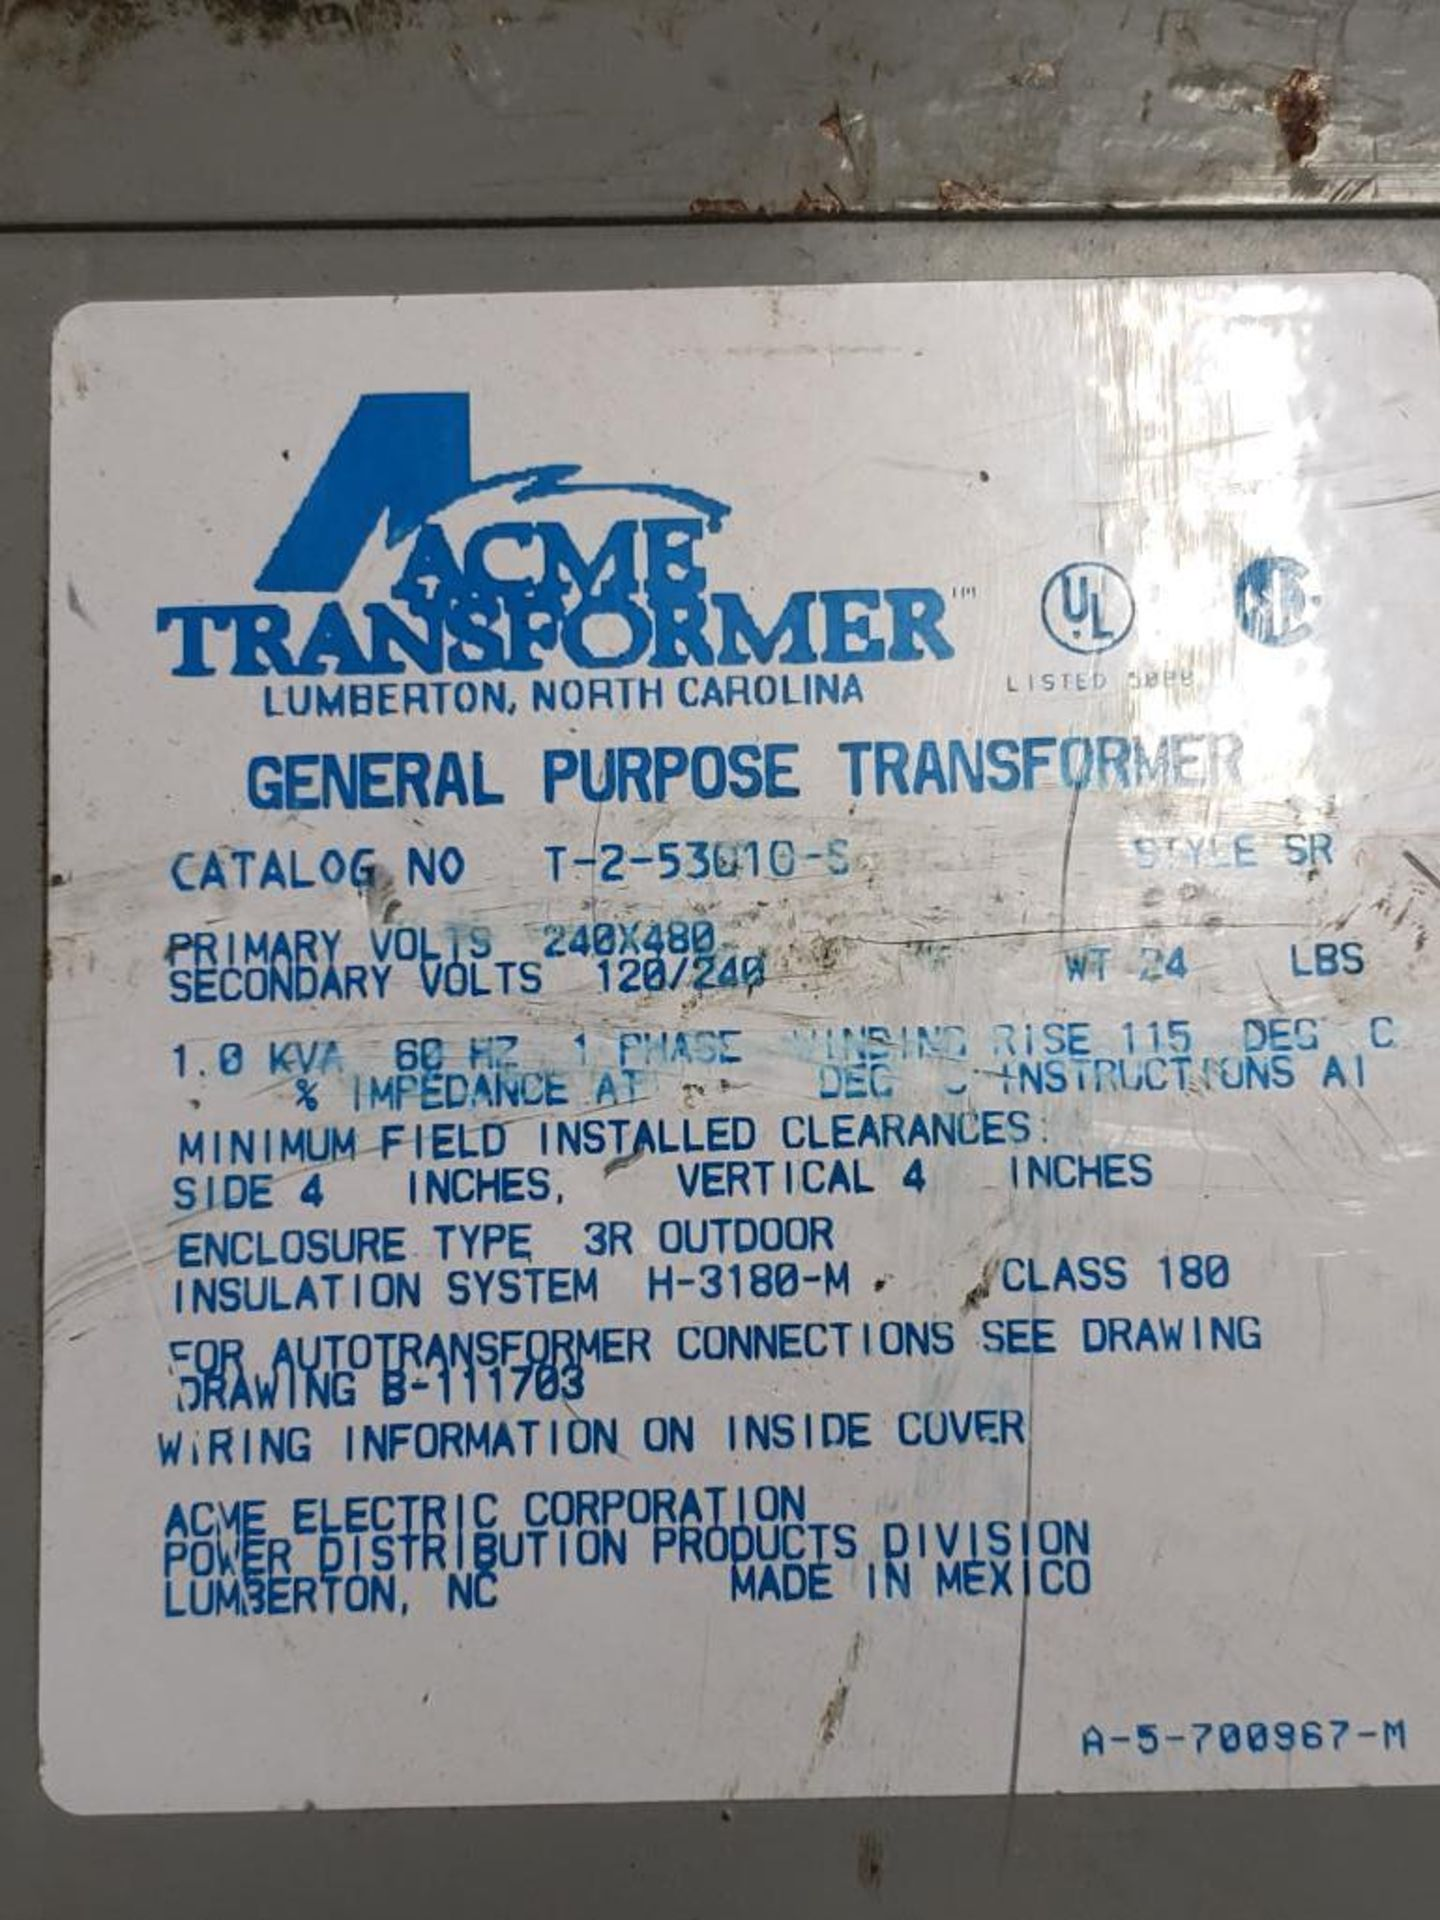 Qty 2 - ACME Transformer T-2-53010-S General purpose transformer. - Image 3 of 3